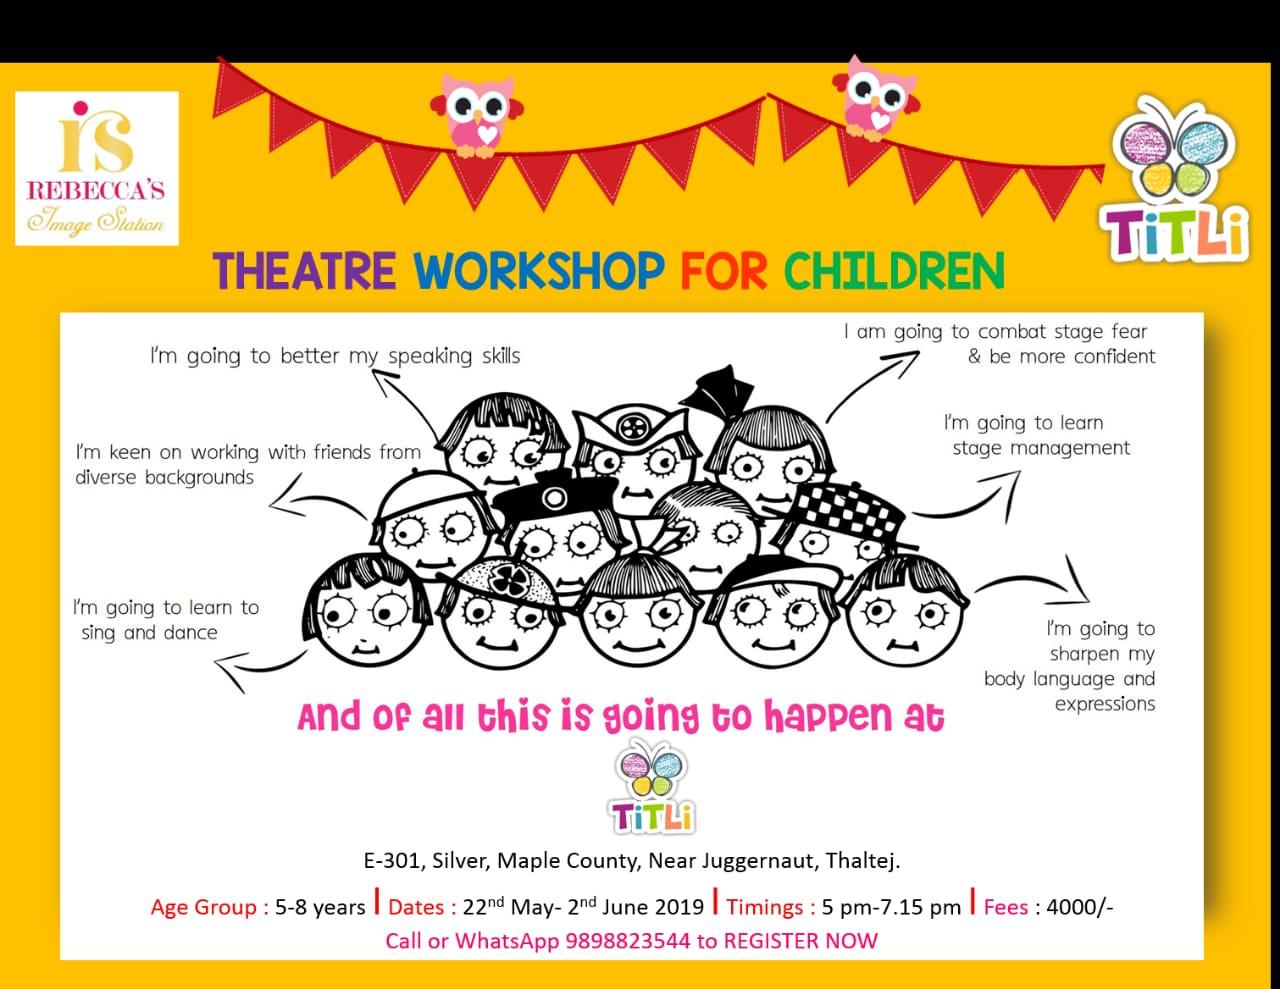 https://creativeyatra.com/wp-content/uploads/2019/05/Theater-Workshop-For-Children.jpg